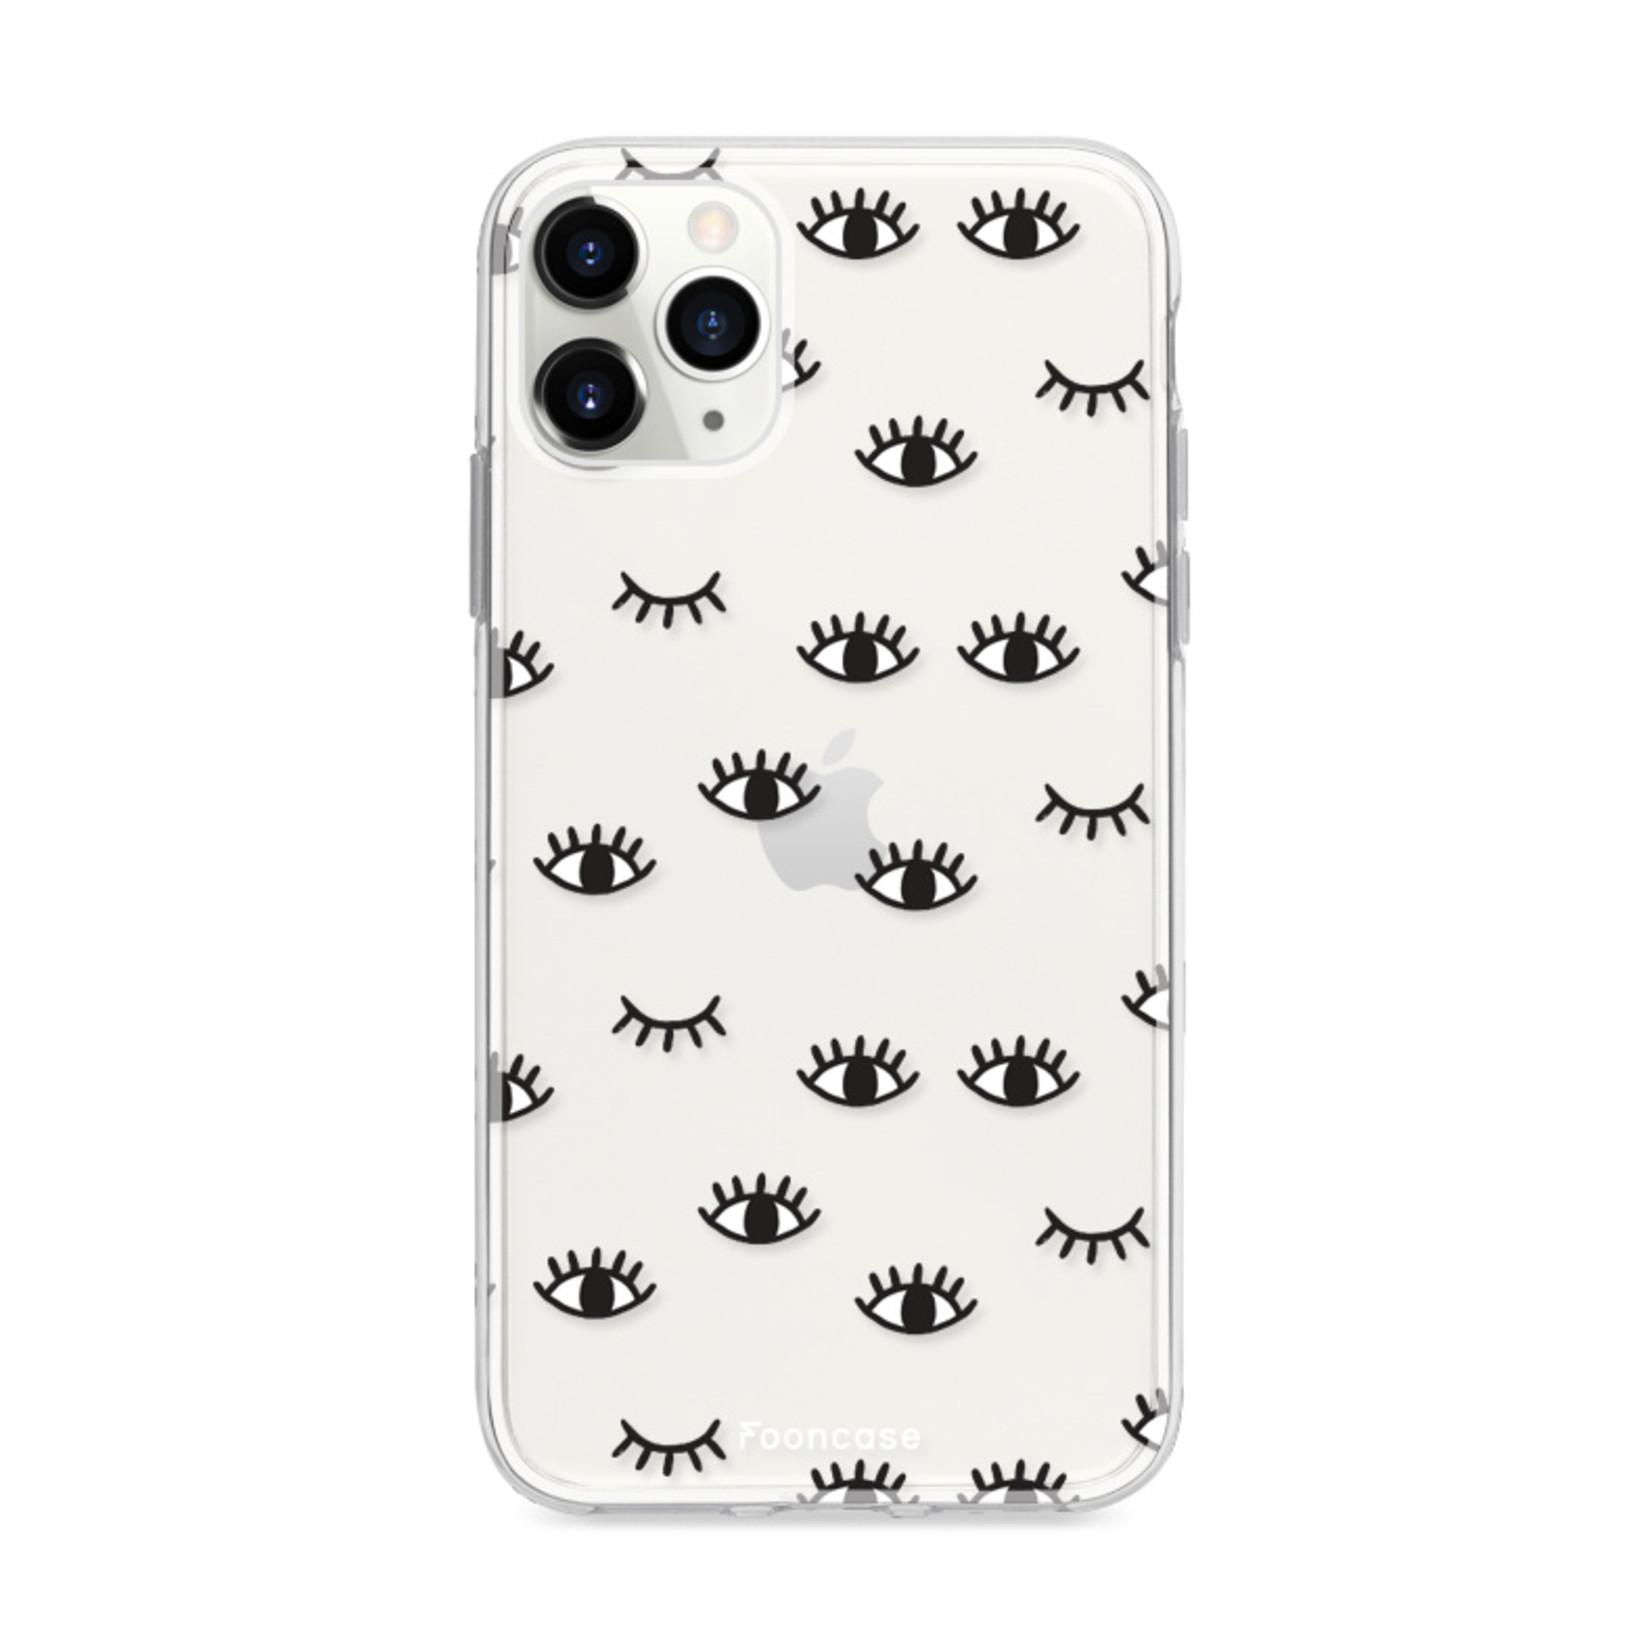 FOONCASE IPhone 12 Pro Max Case - Eyes